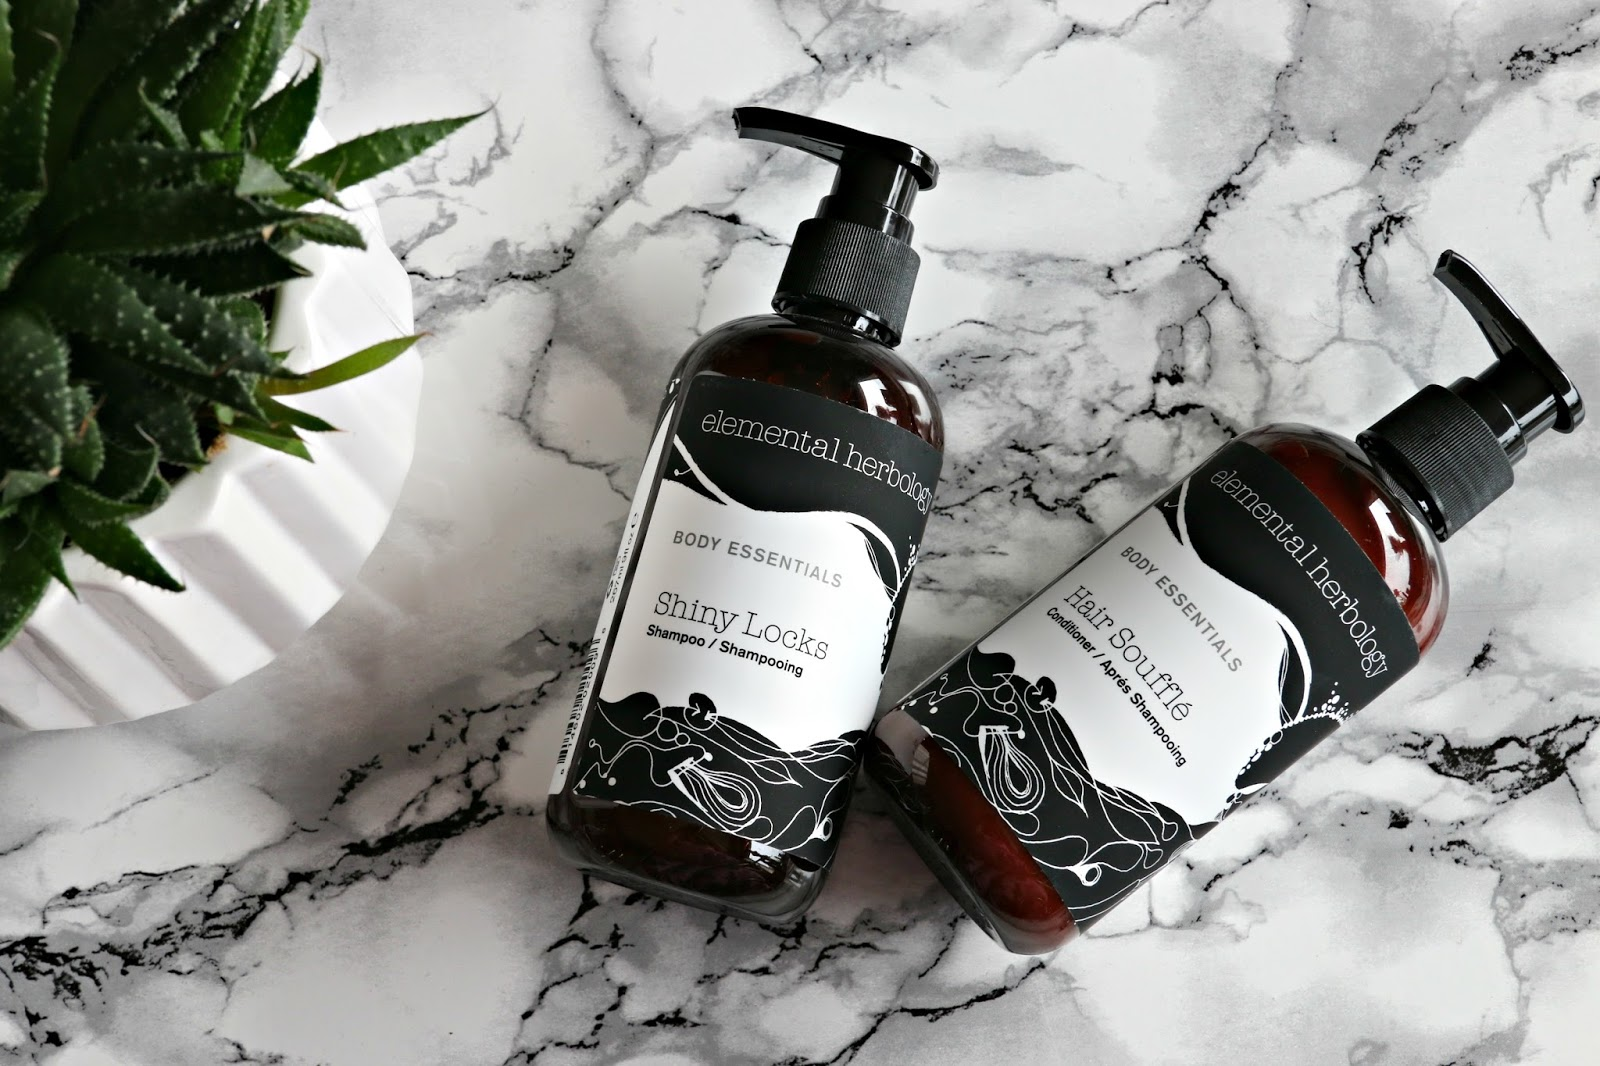 Elemental Herbology Shiny Locks Shampoo & Hair Soufflé Conditioner Review